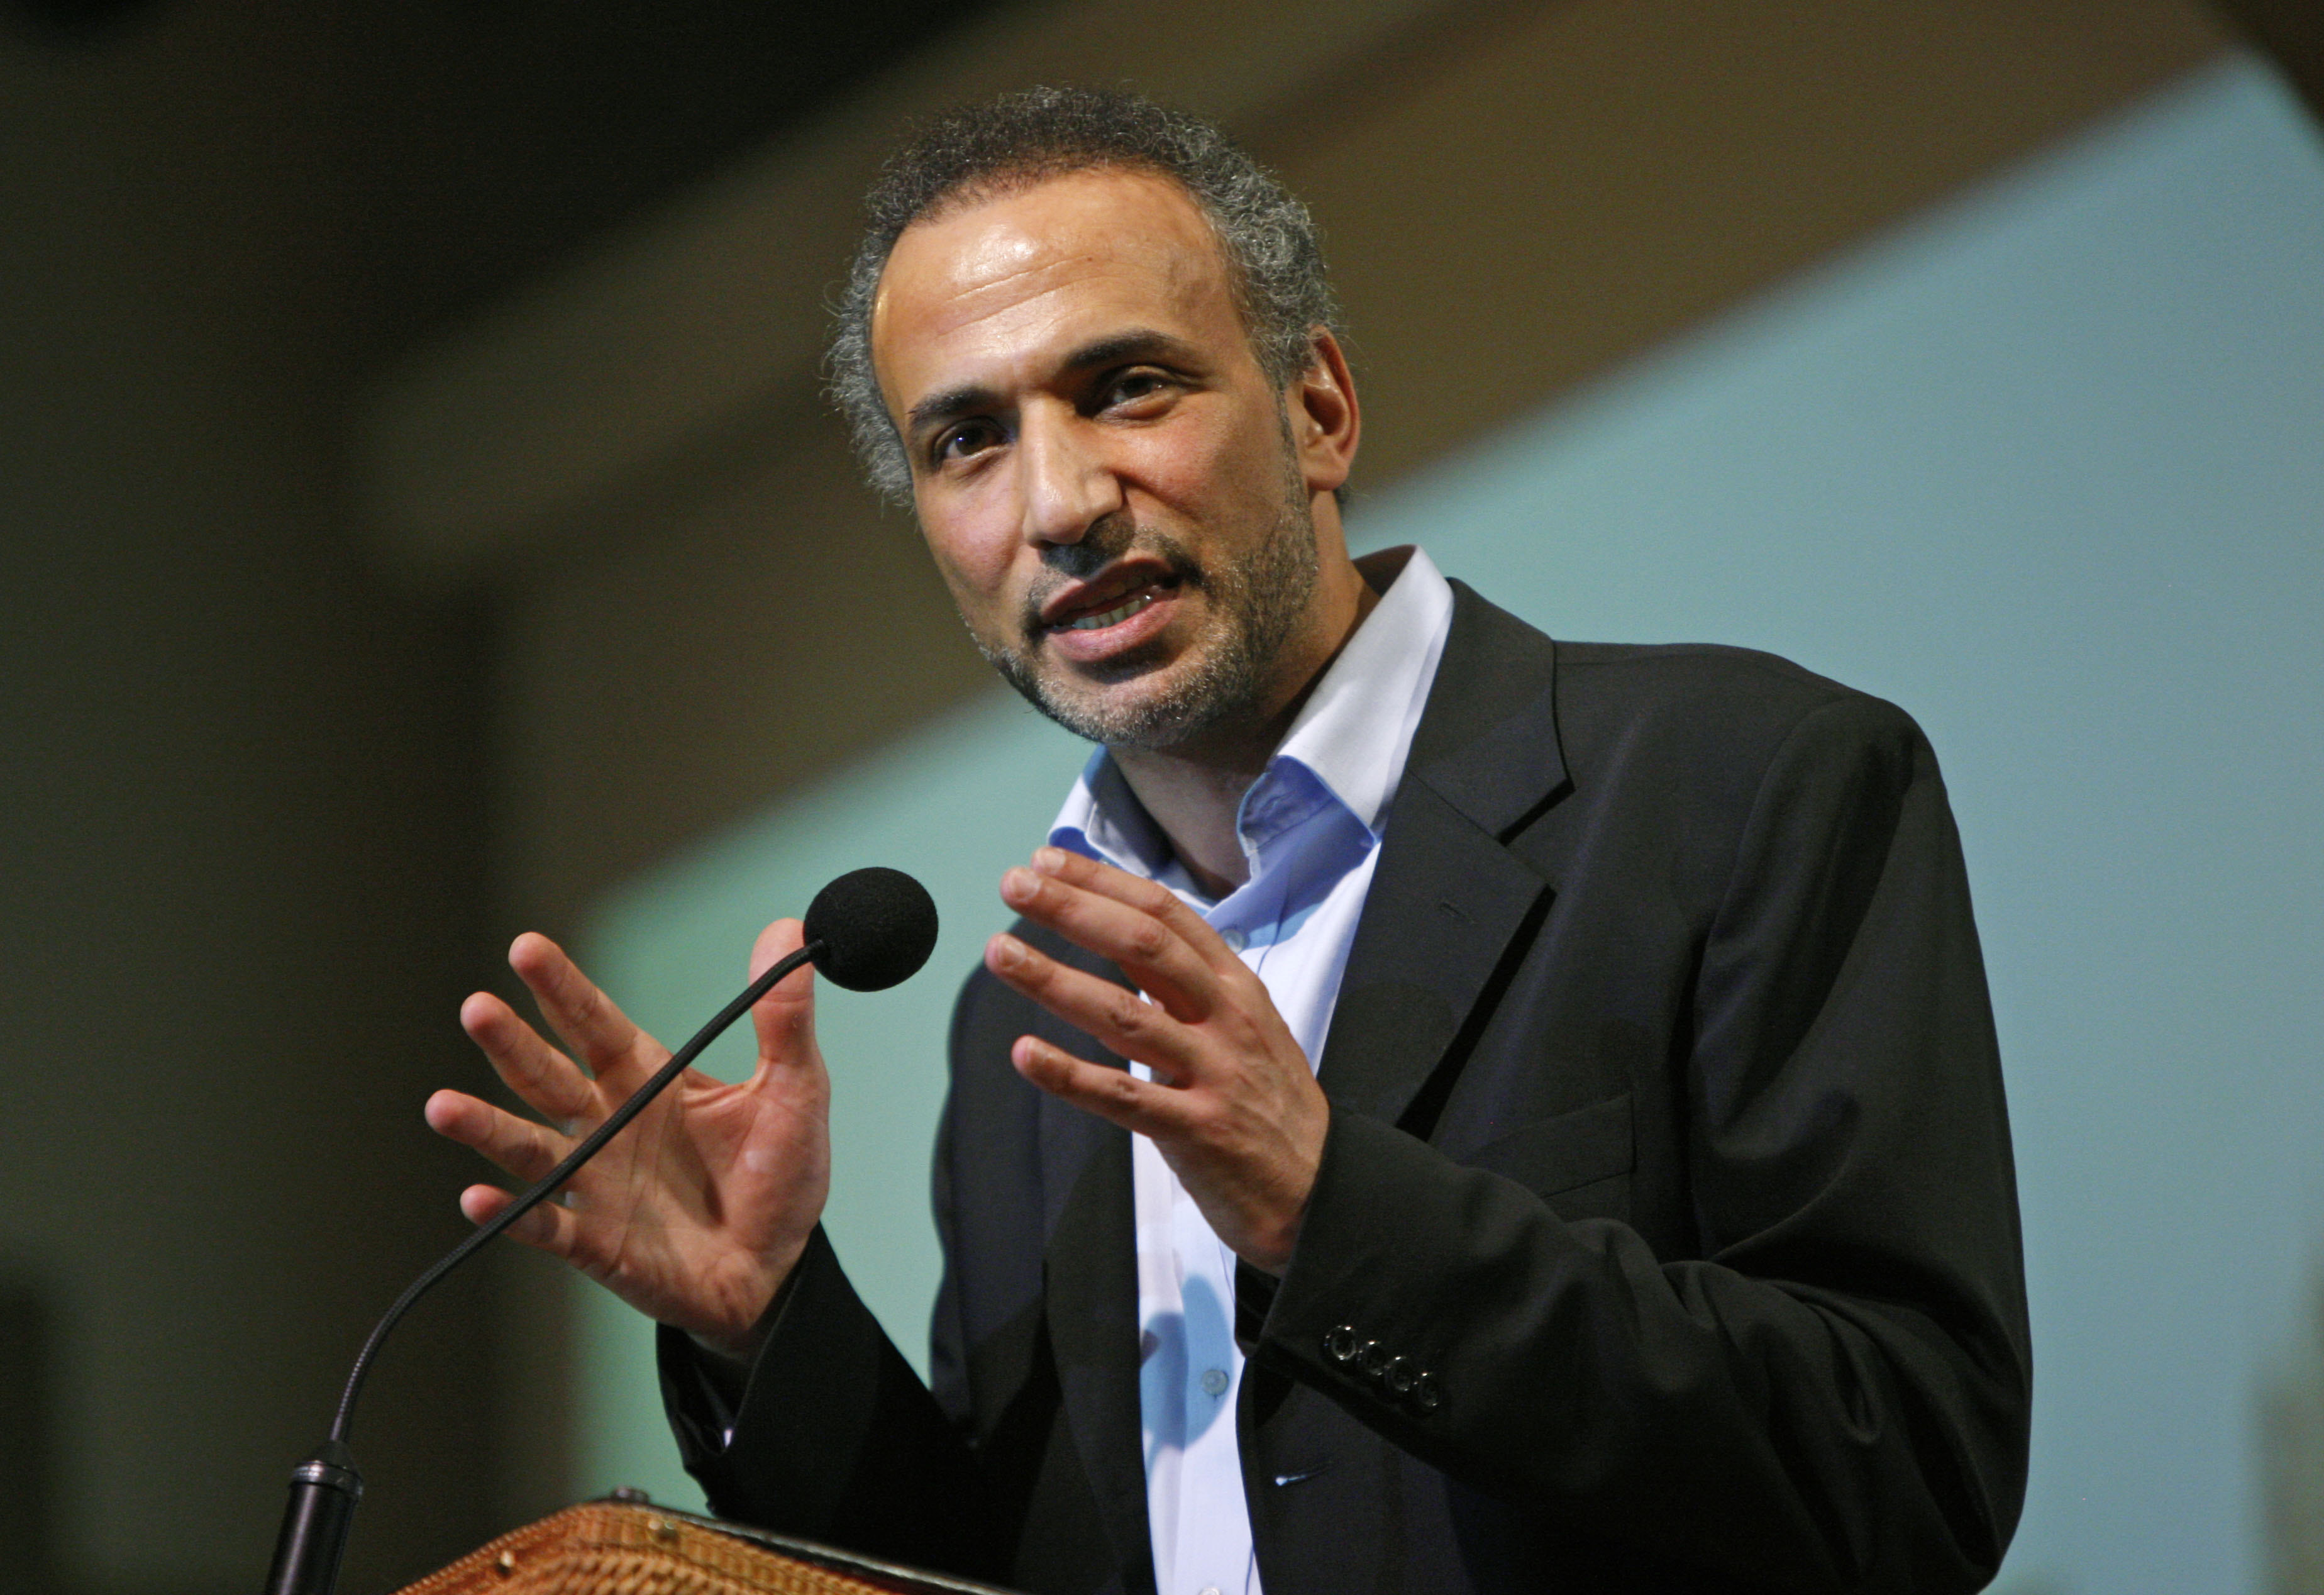 Tariq Ramadan: Oxford Professor, Detention Without Trial